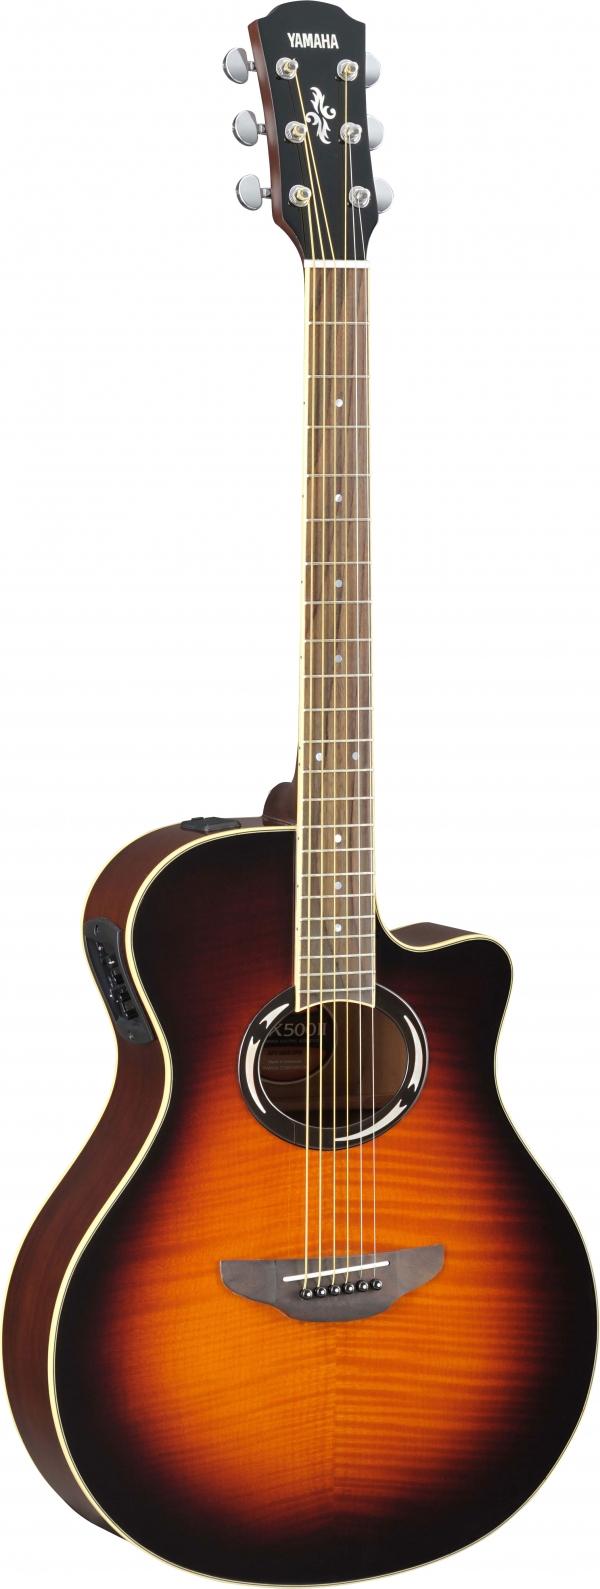 Yamaha - [APX500IIFM OVS] Chitarra Acustica Elettficata Old Violin Sunburst